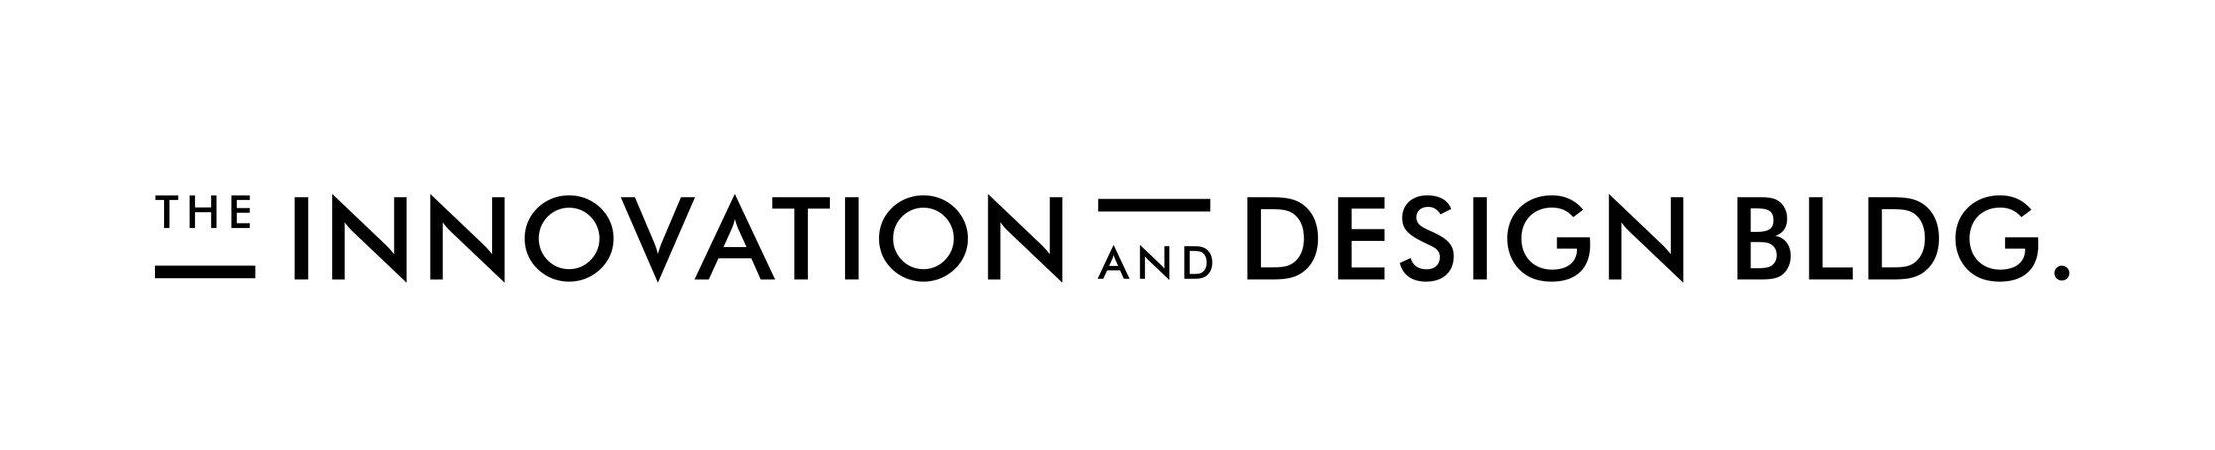 IDB-Primary Logo-Final-20130528.jpg